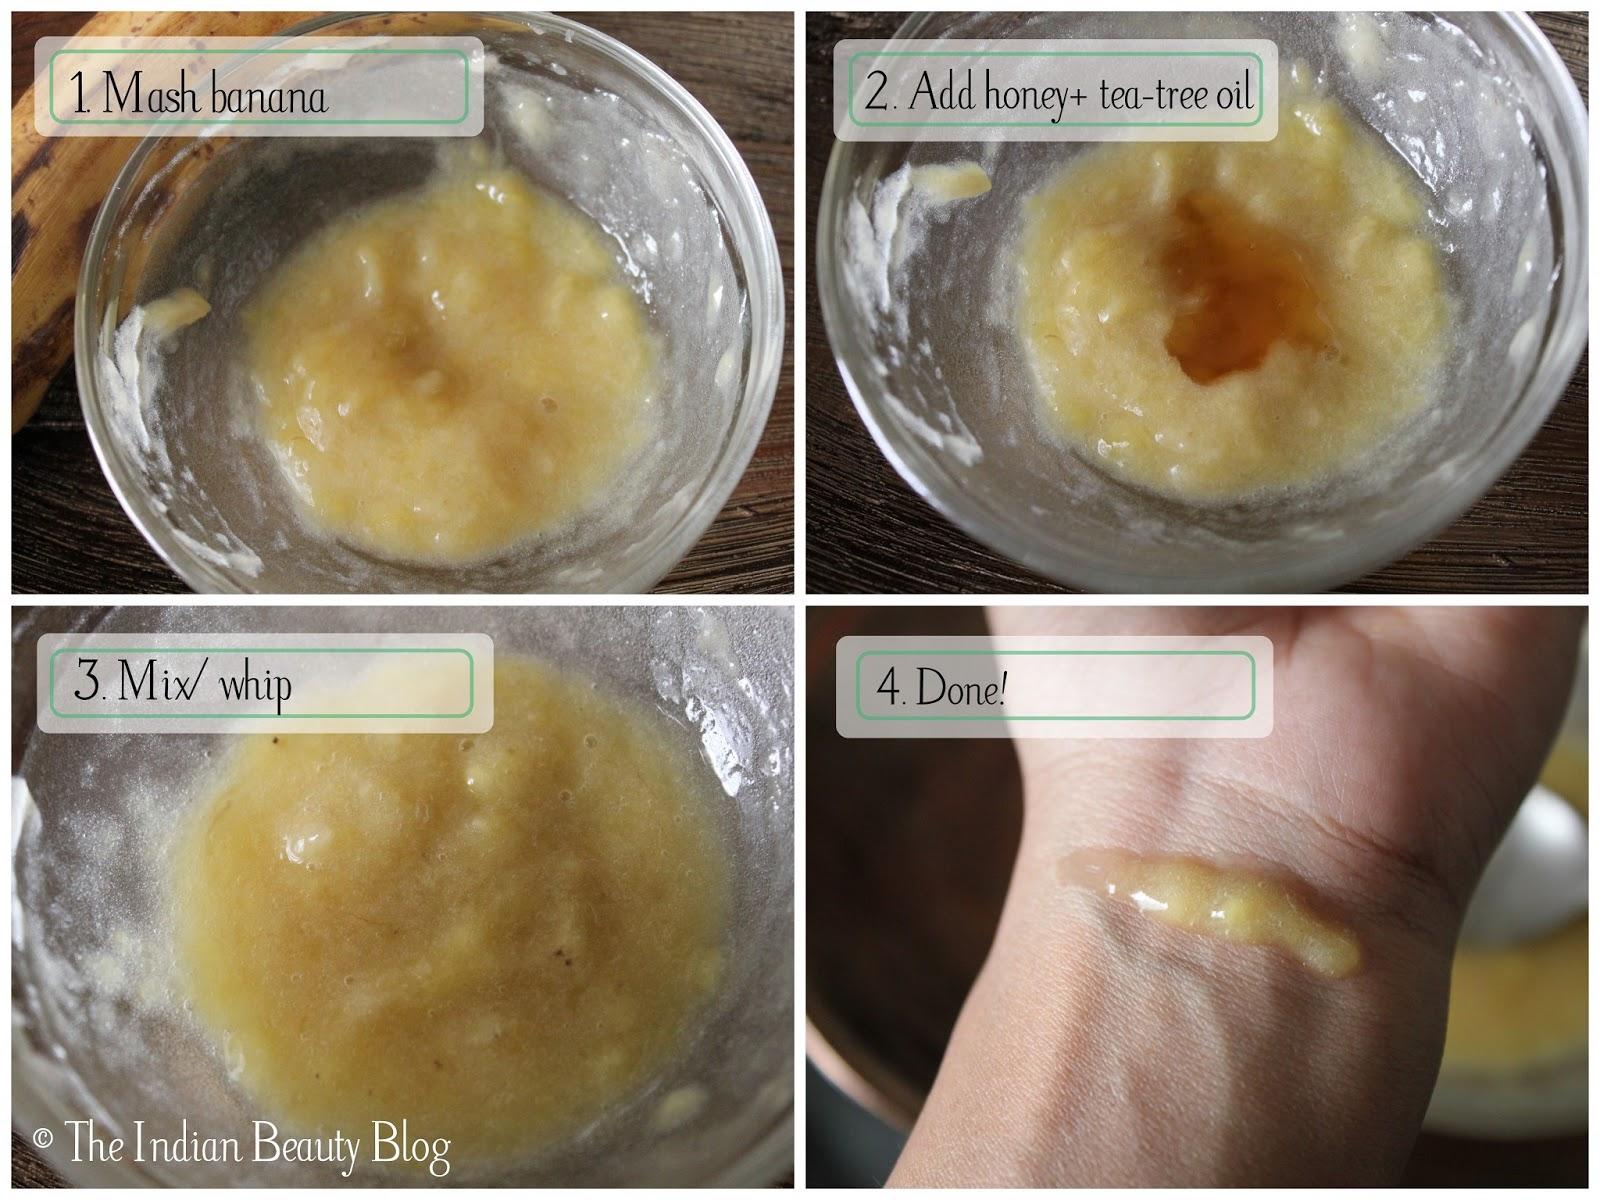 Sunday Pamperings: DIY Anti-acne face